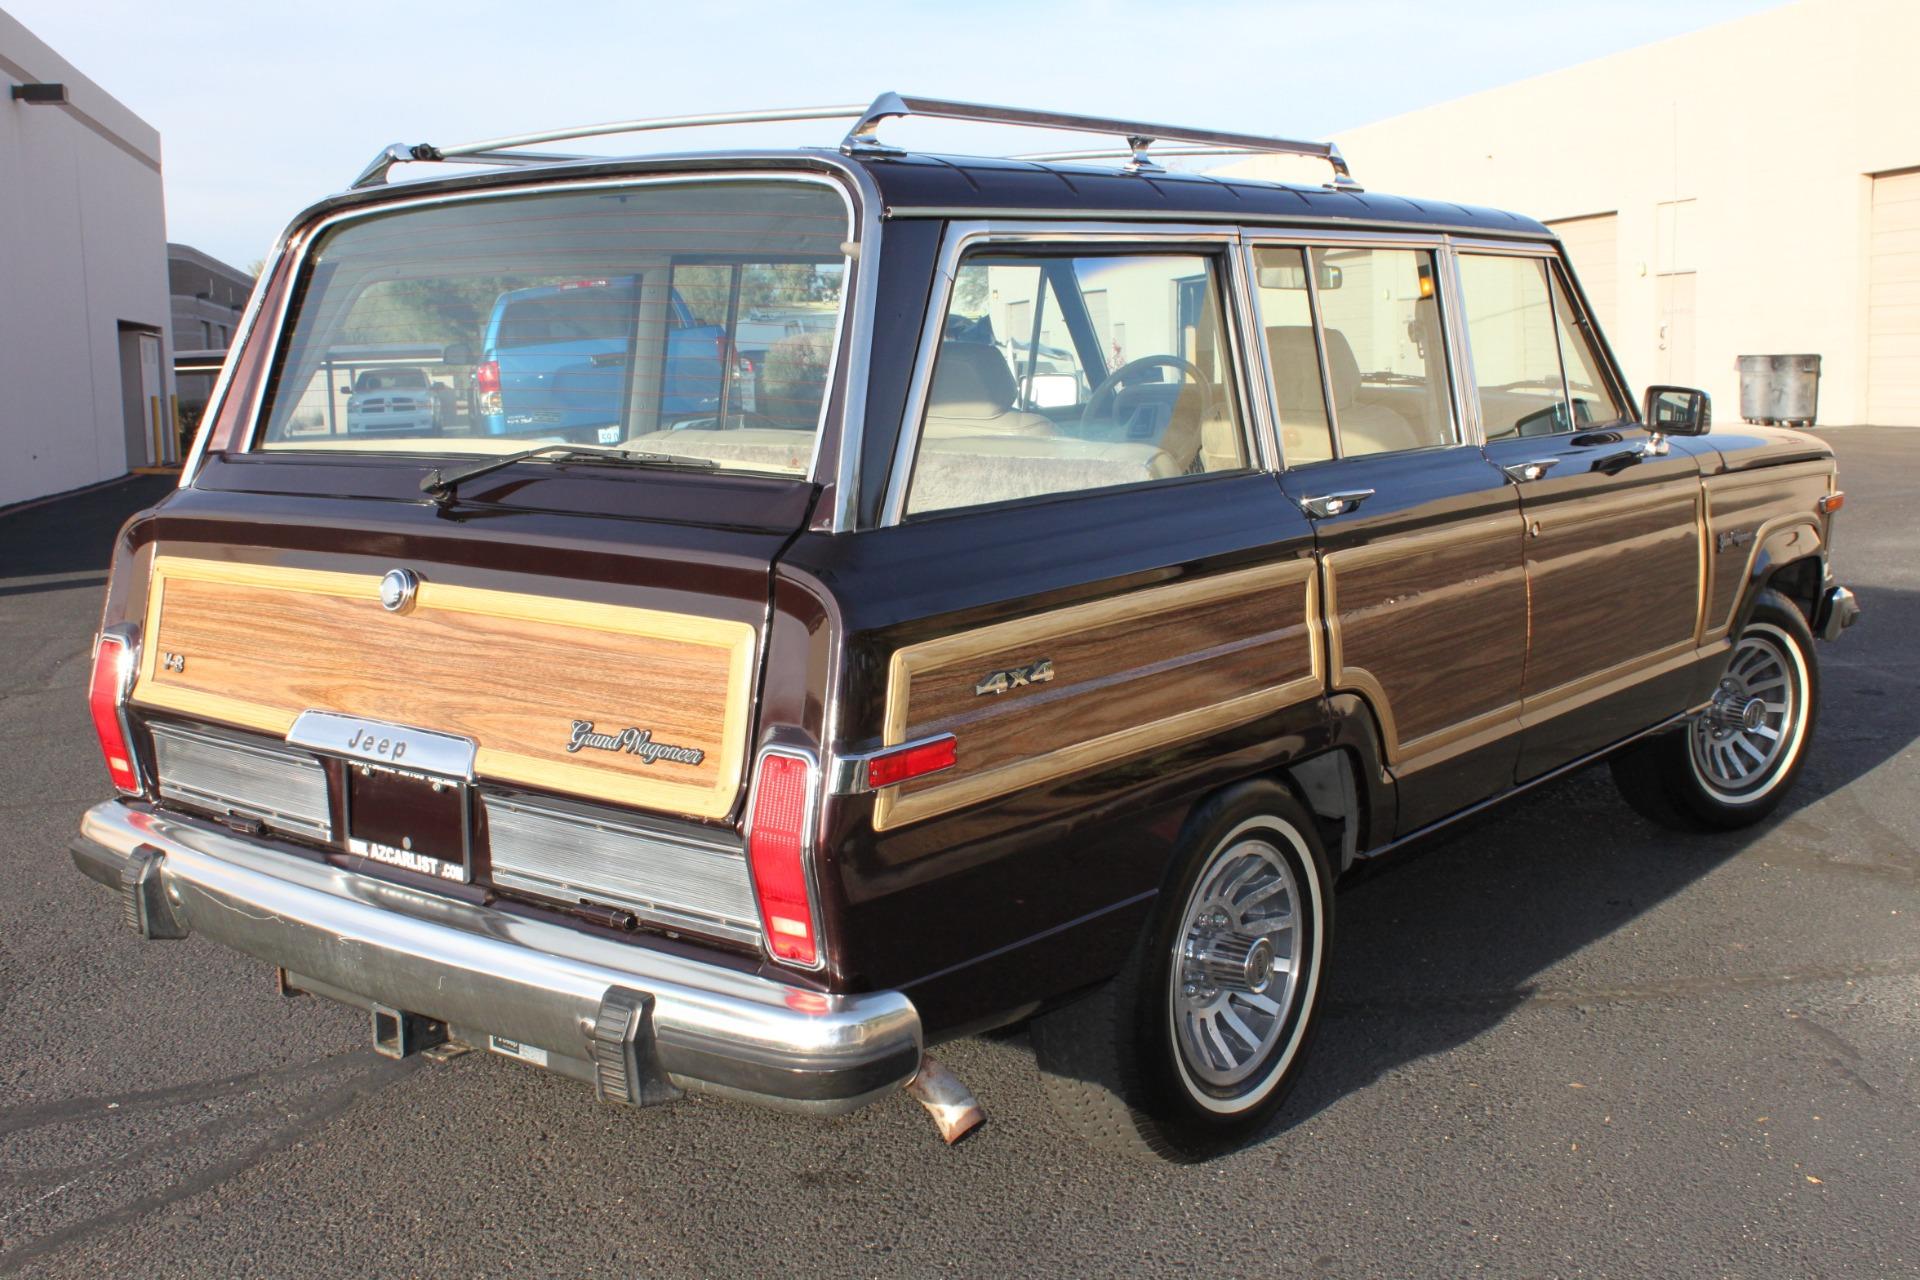 Used-1990-Jeep-Grand-Wagoneer-4X4-Chrysler